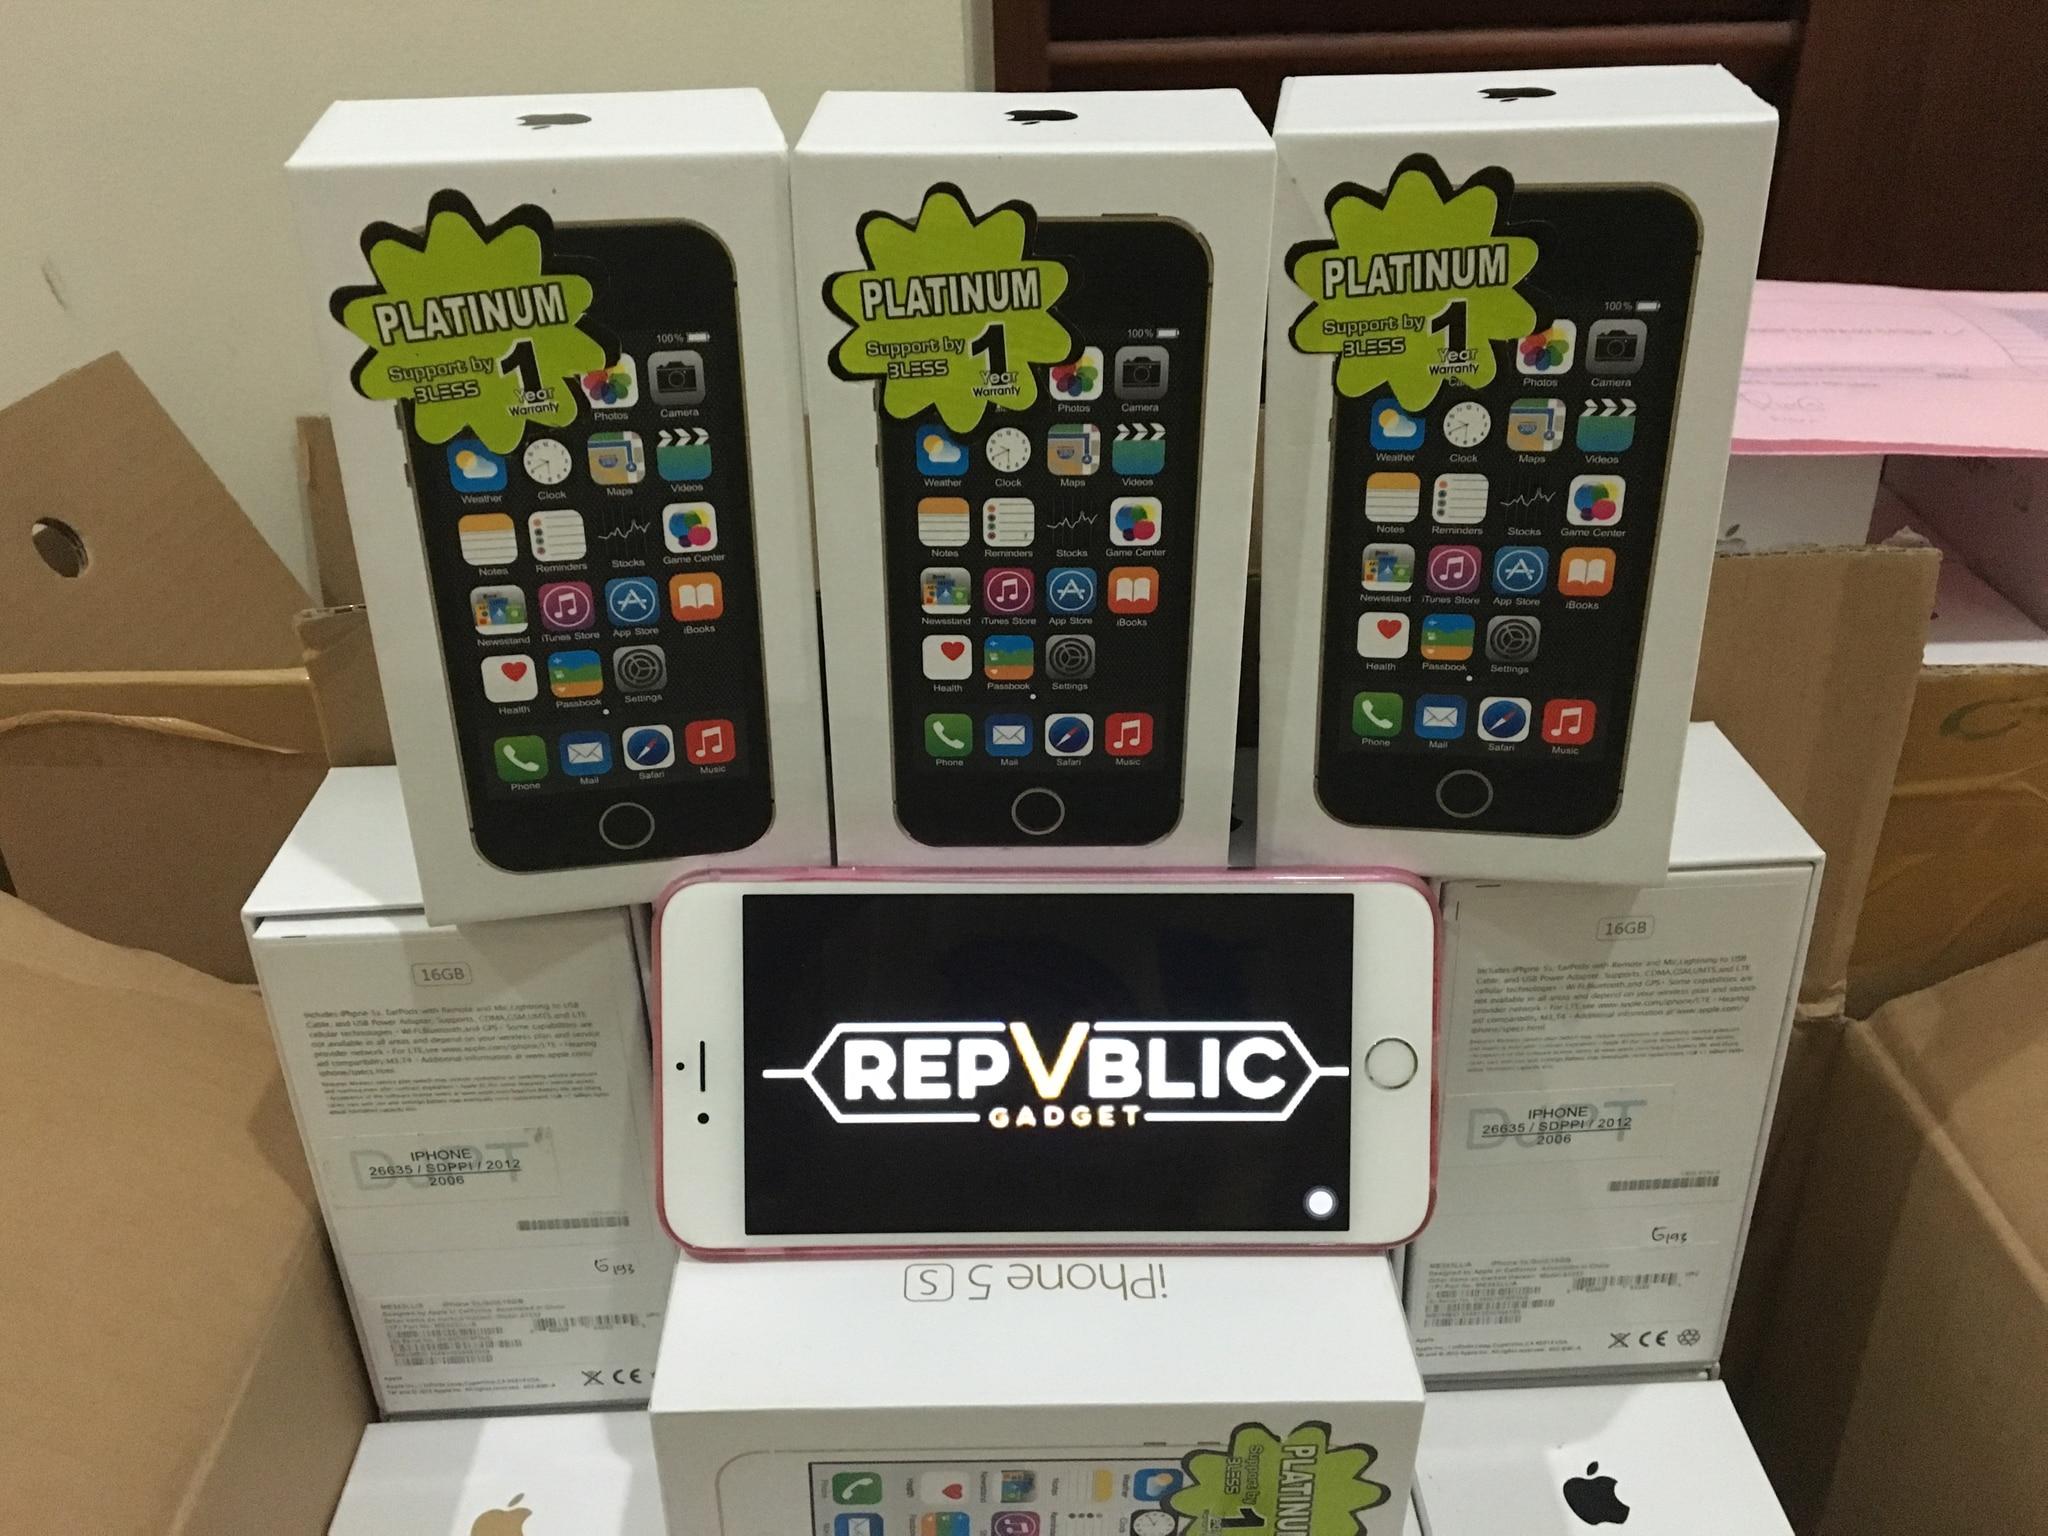 Jual Iphone 5s Grey 32gb New Garansi Platinum 1 Tahun Republic 5 64gb Gadget Tokopedia